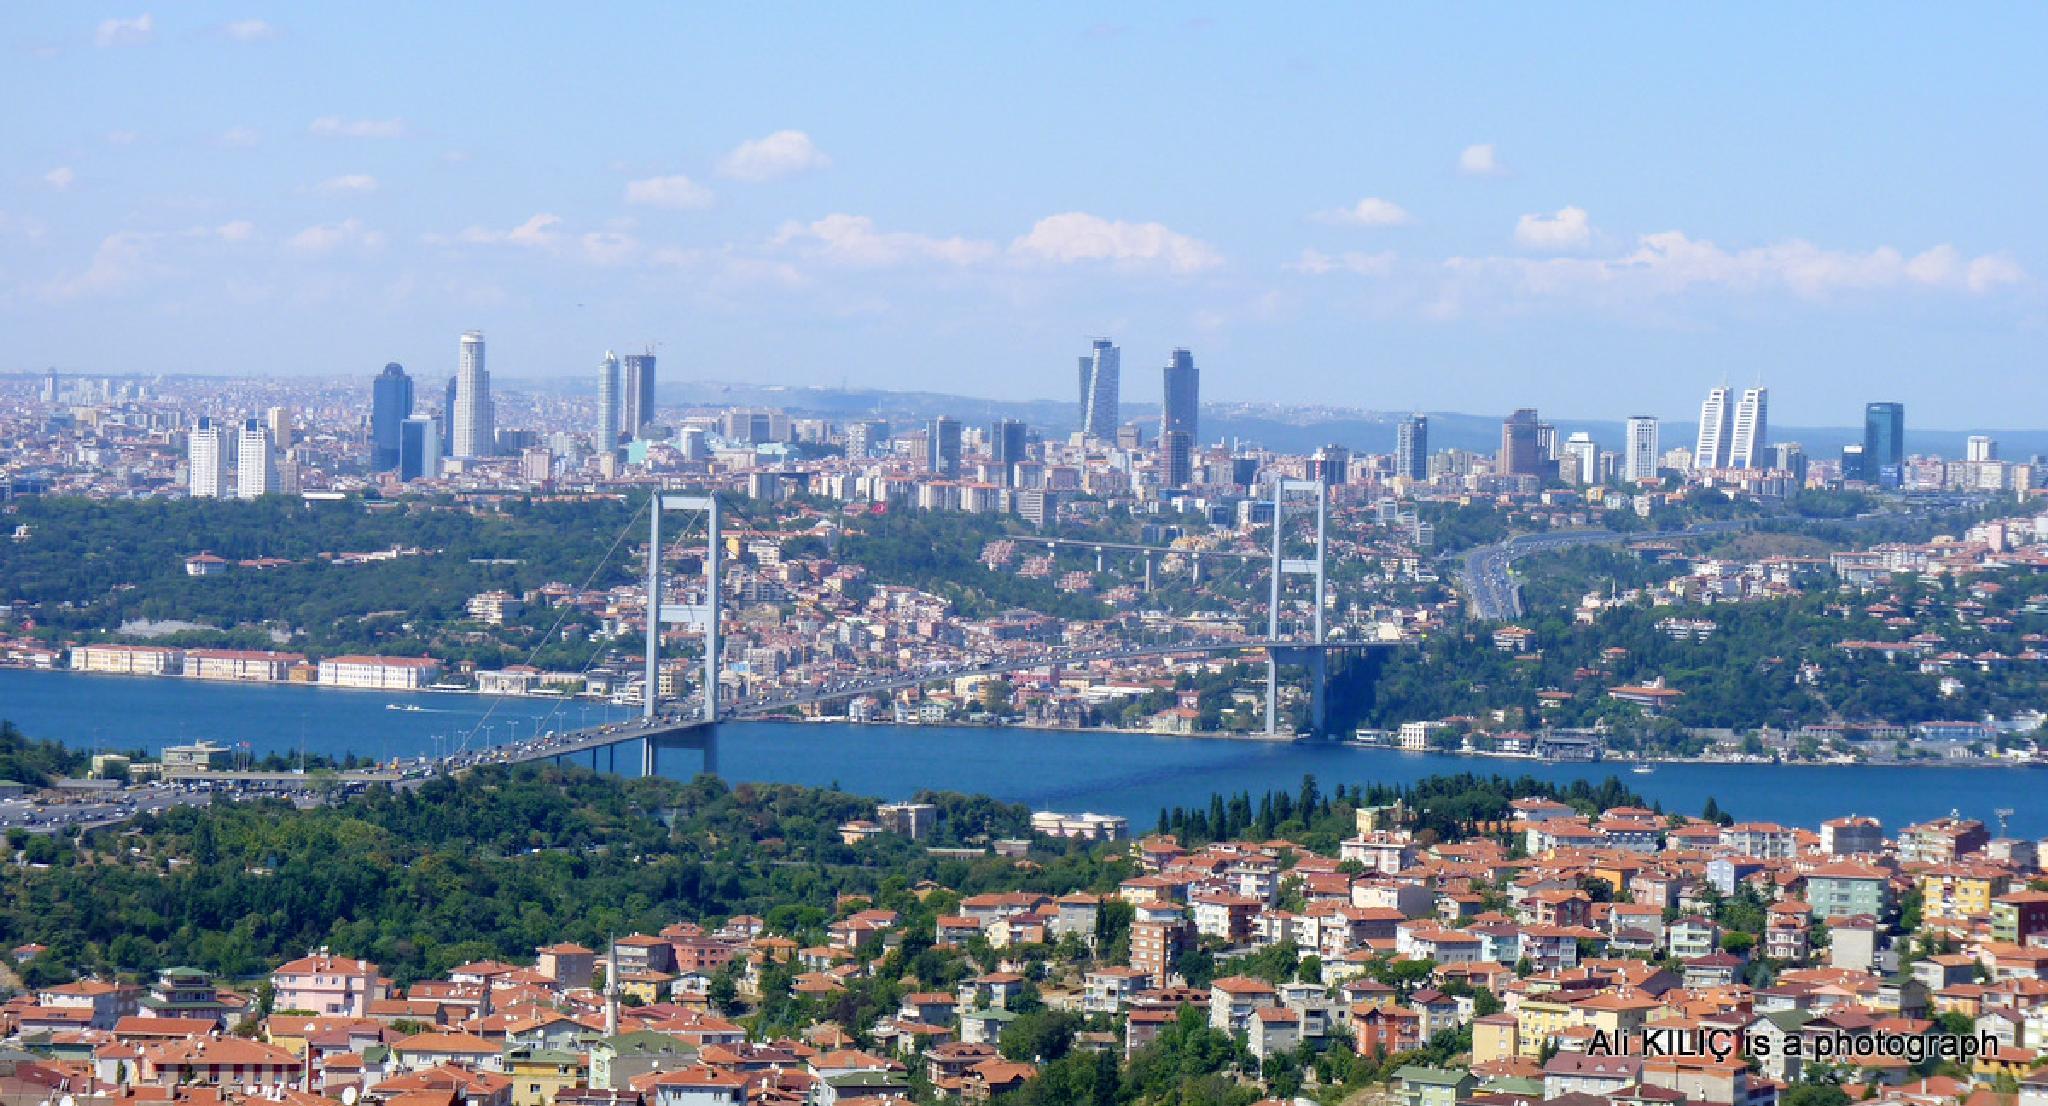 Çamlıca Tepesinden Manzara..Camlica Hill's View by Ali KILIÇ